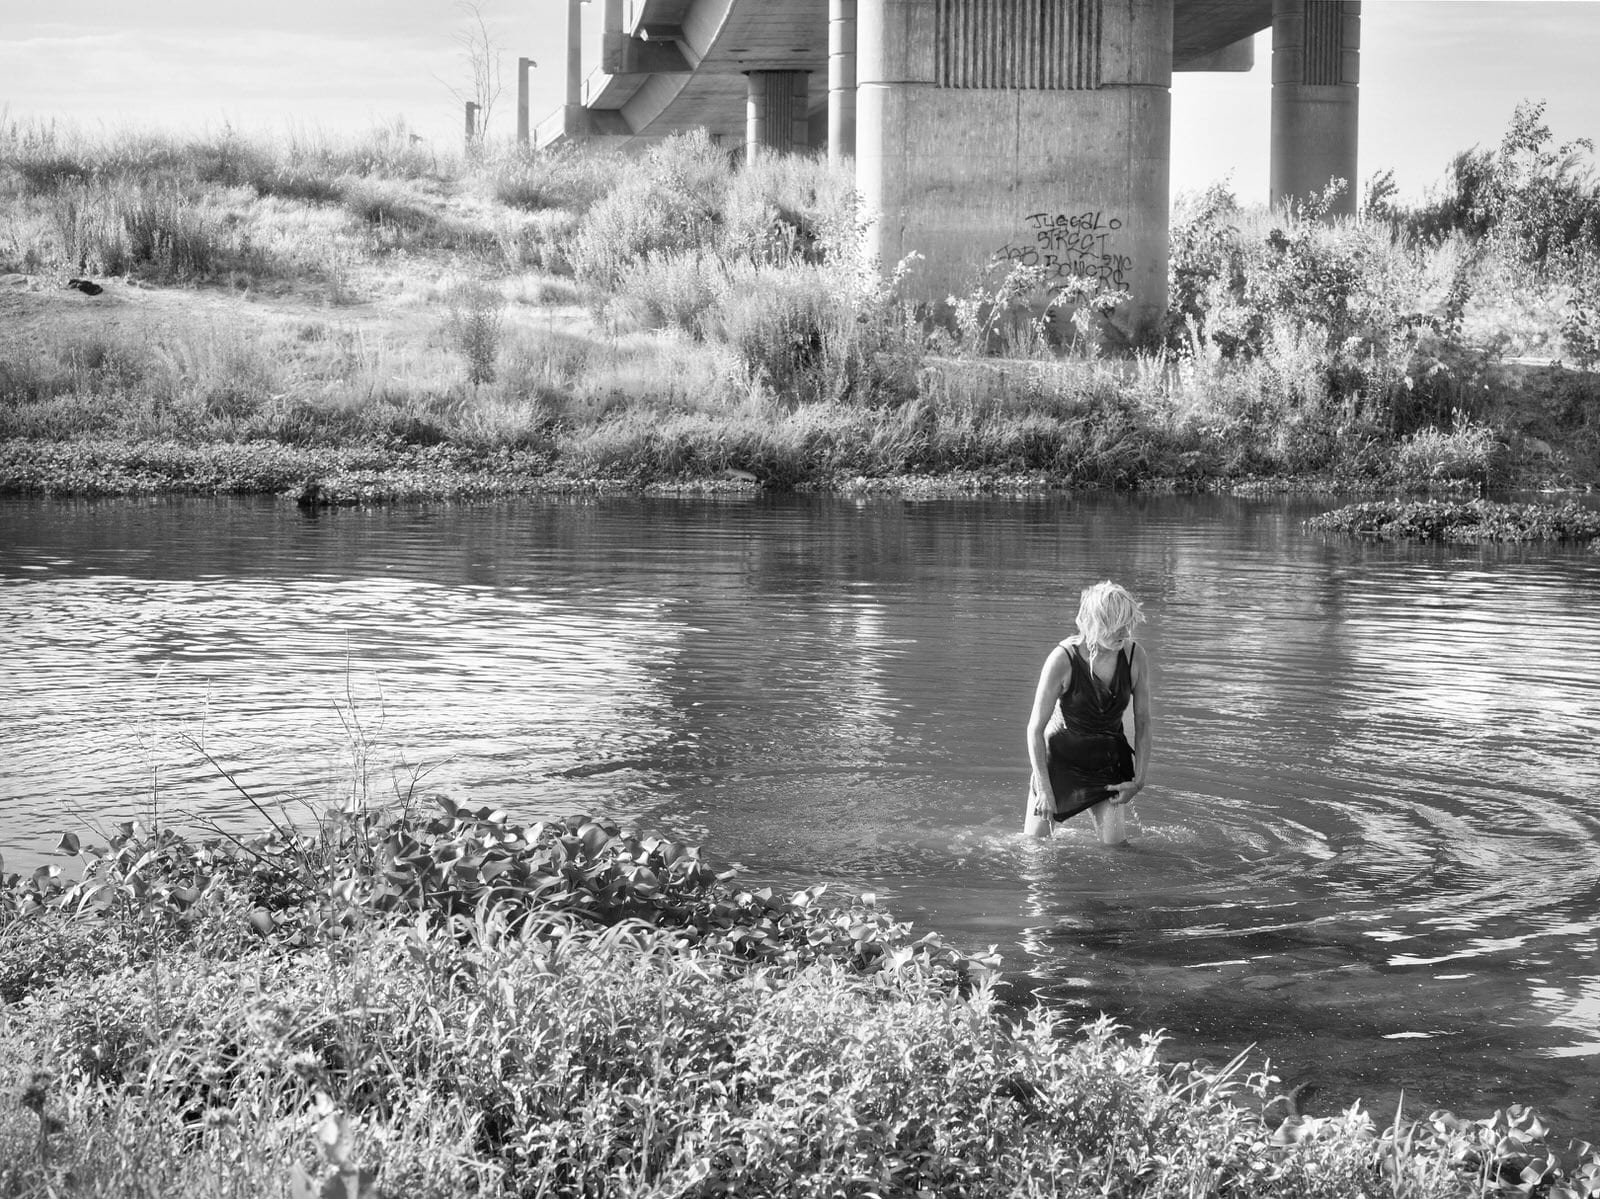 371_Grannan_Deb soaking wet Modesto CA_2013